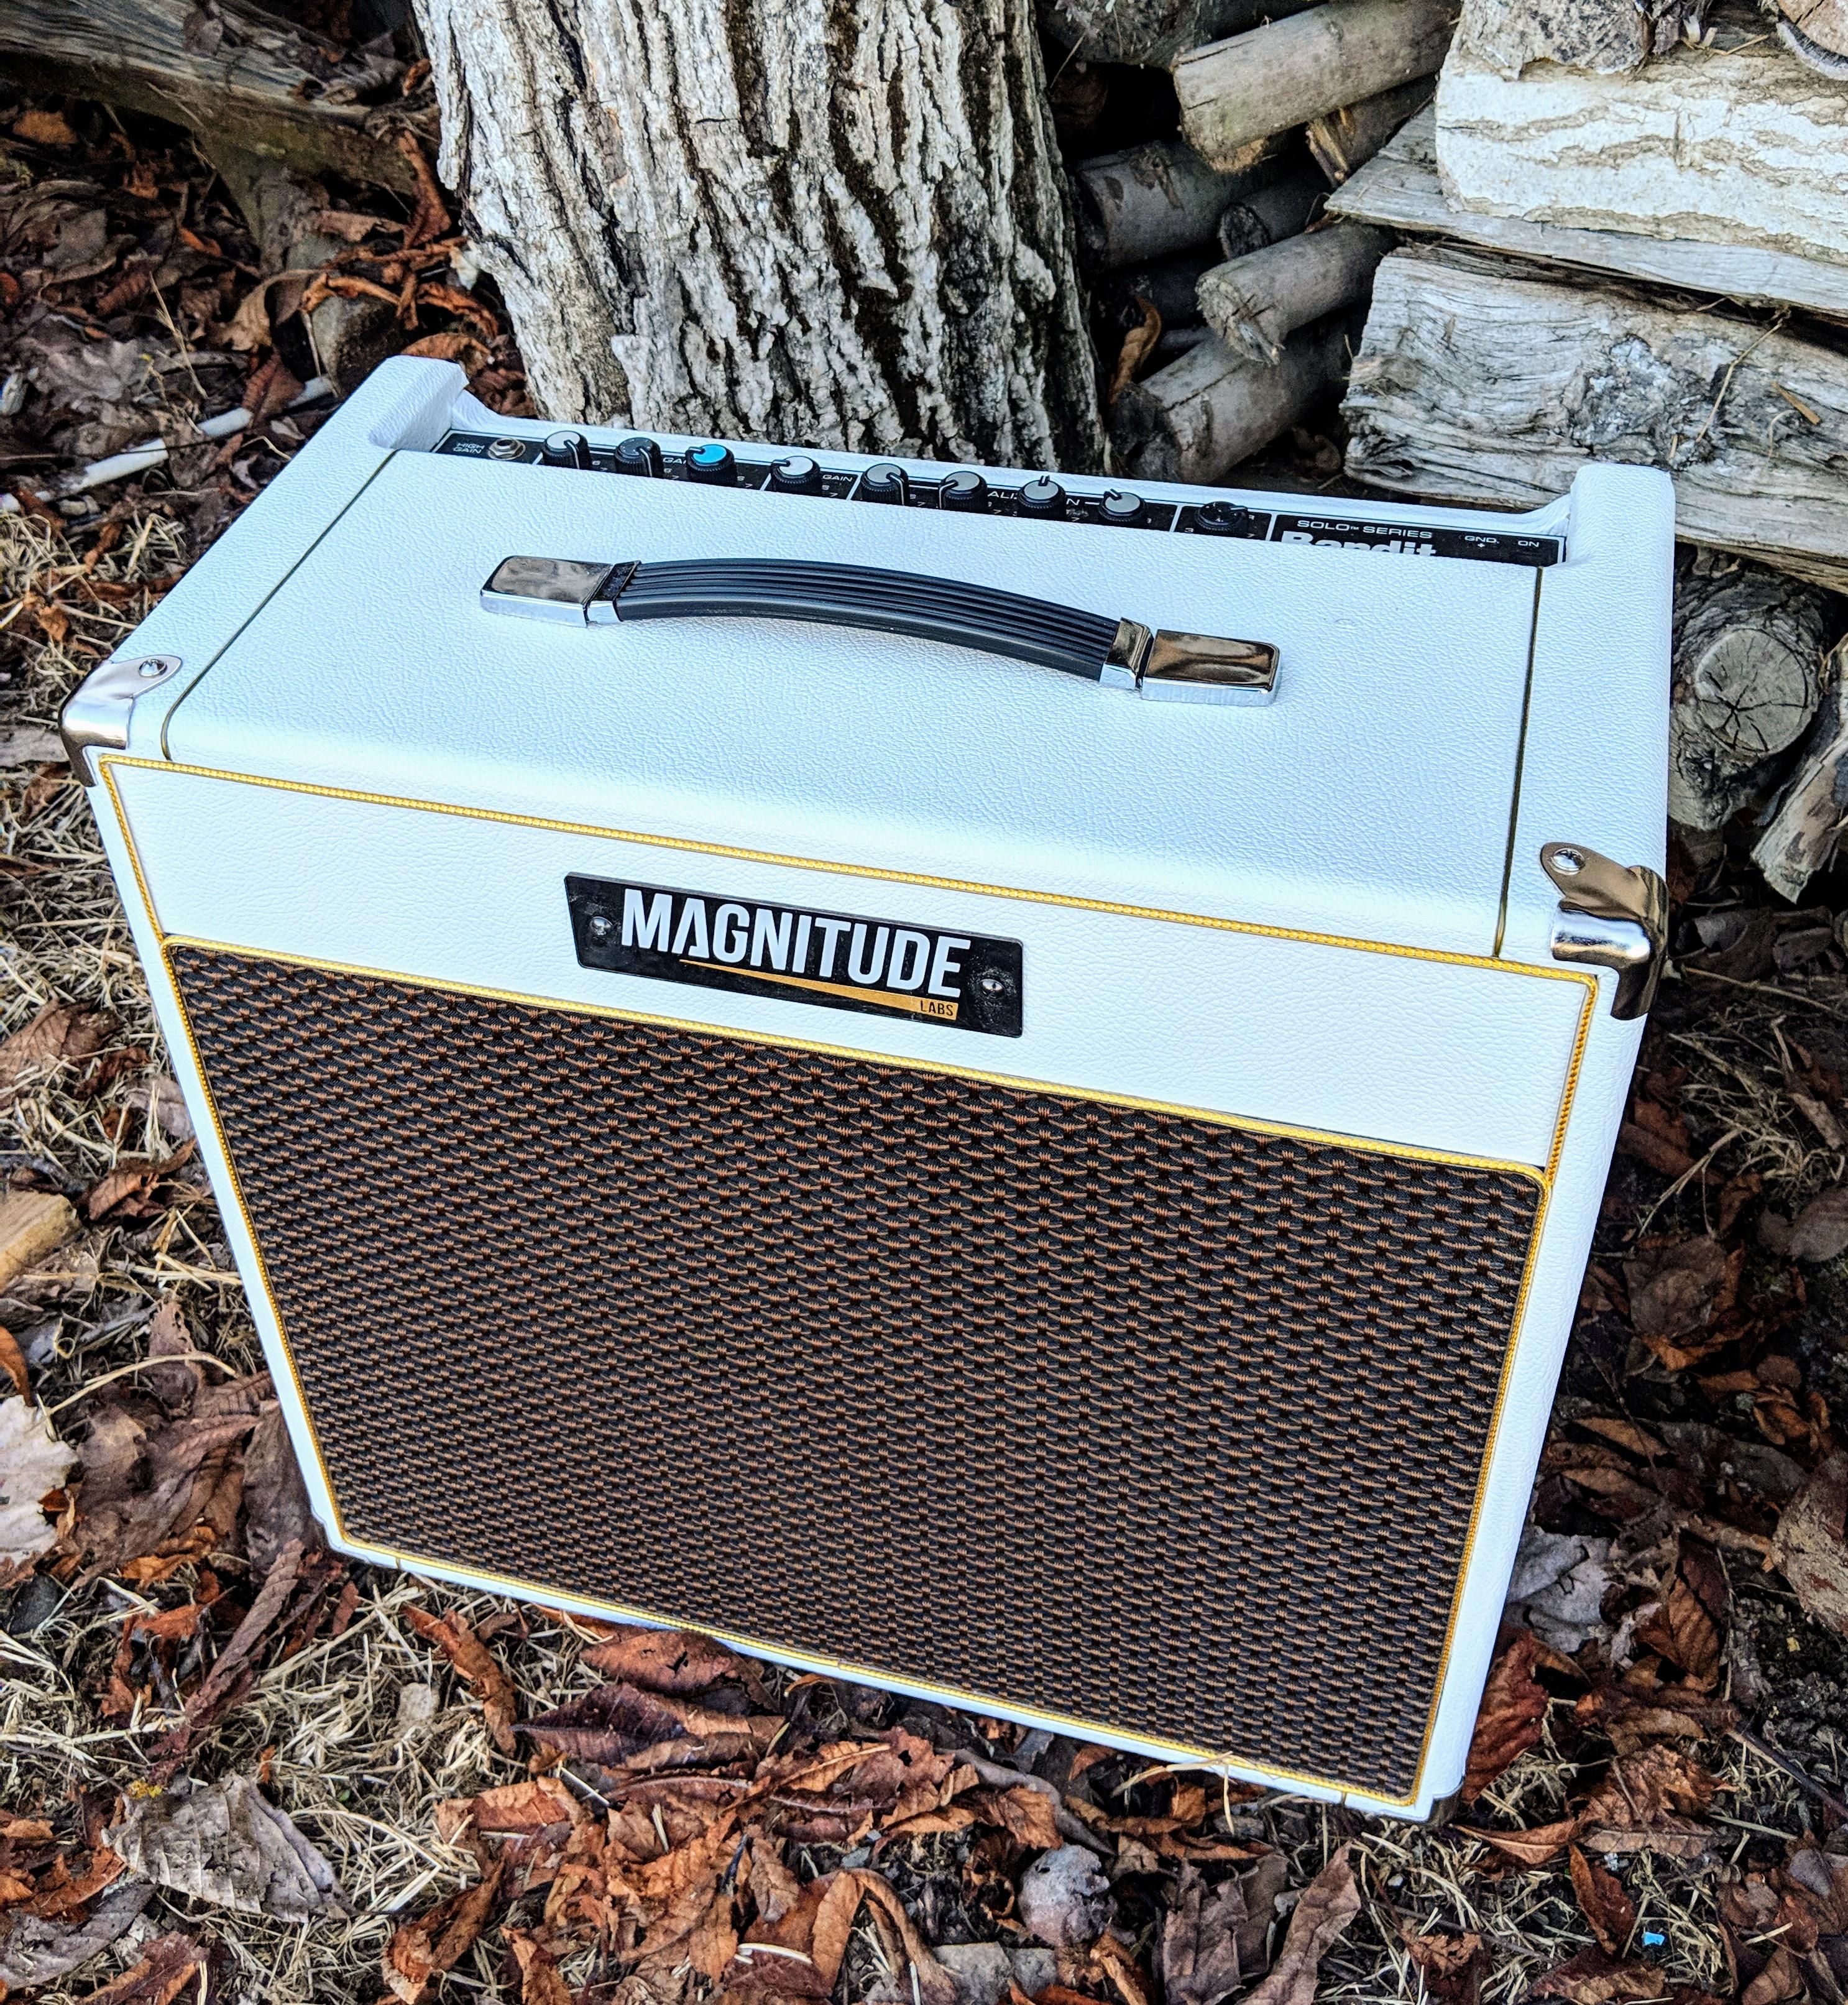 Magnitude Banditooo 65